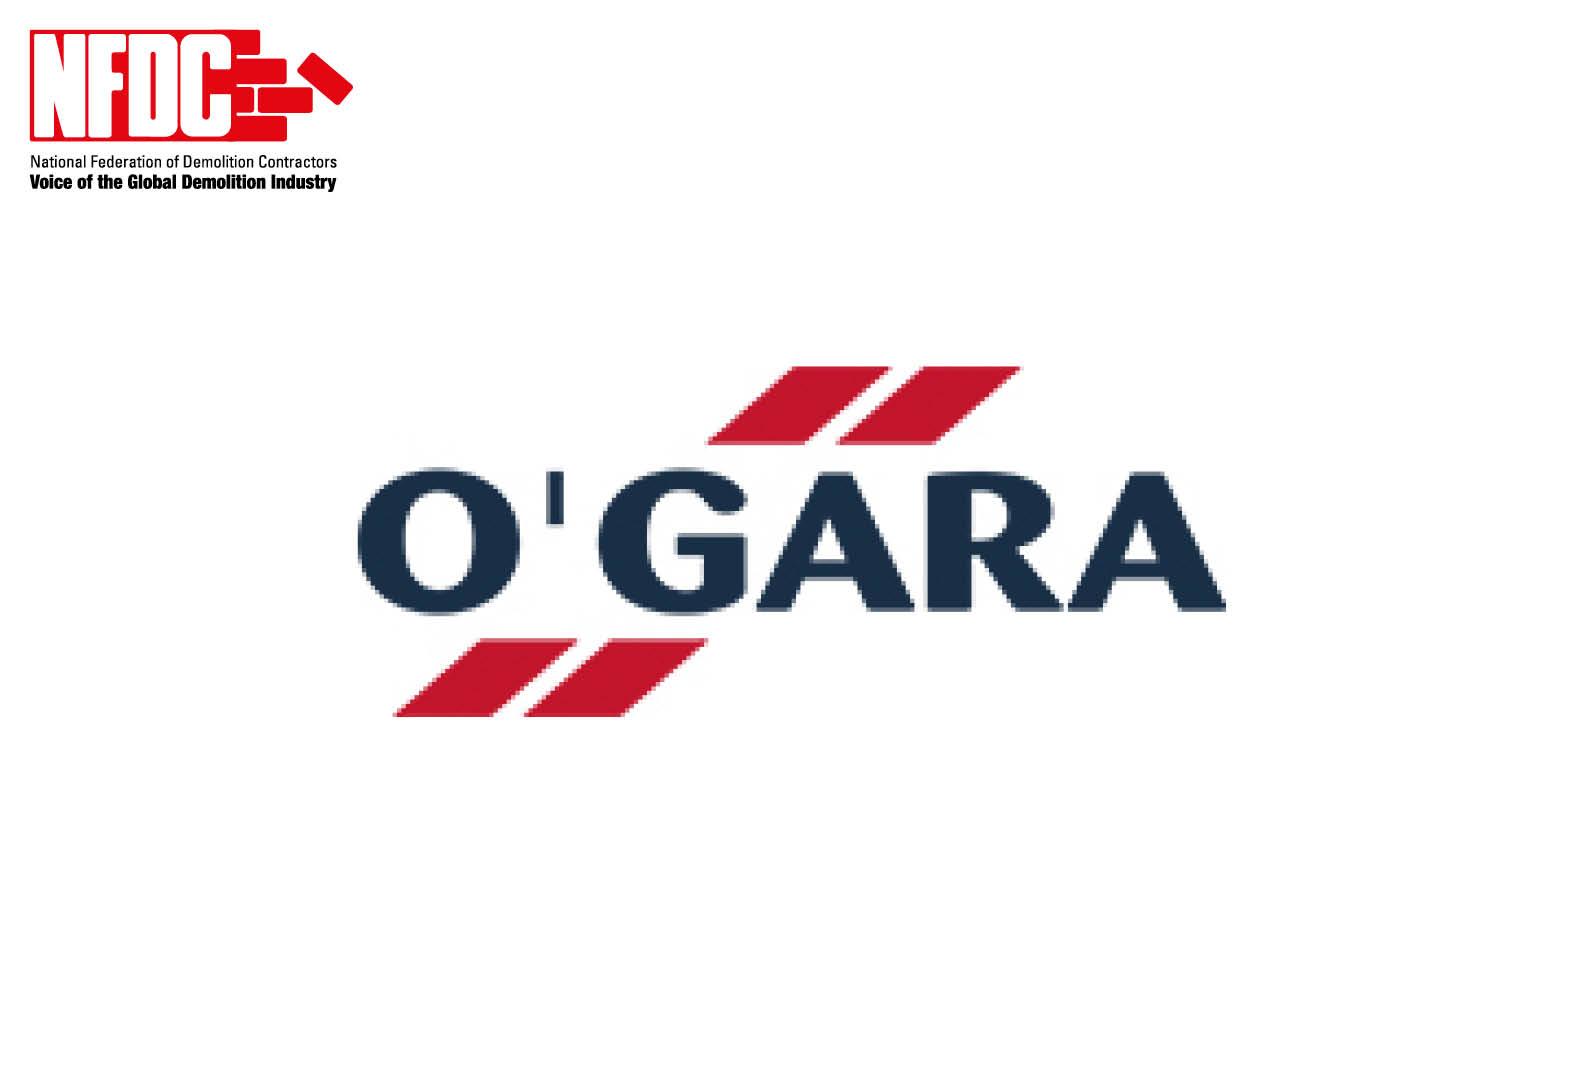 Frank O'Gara